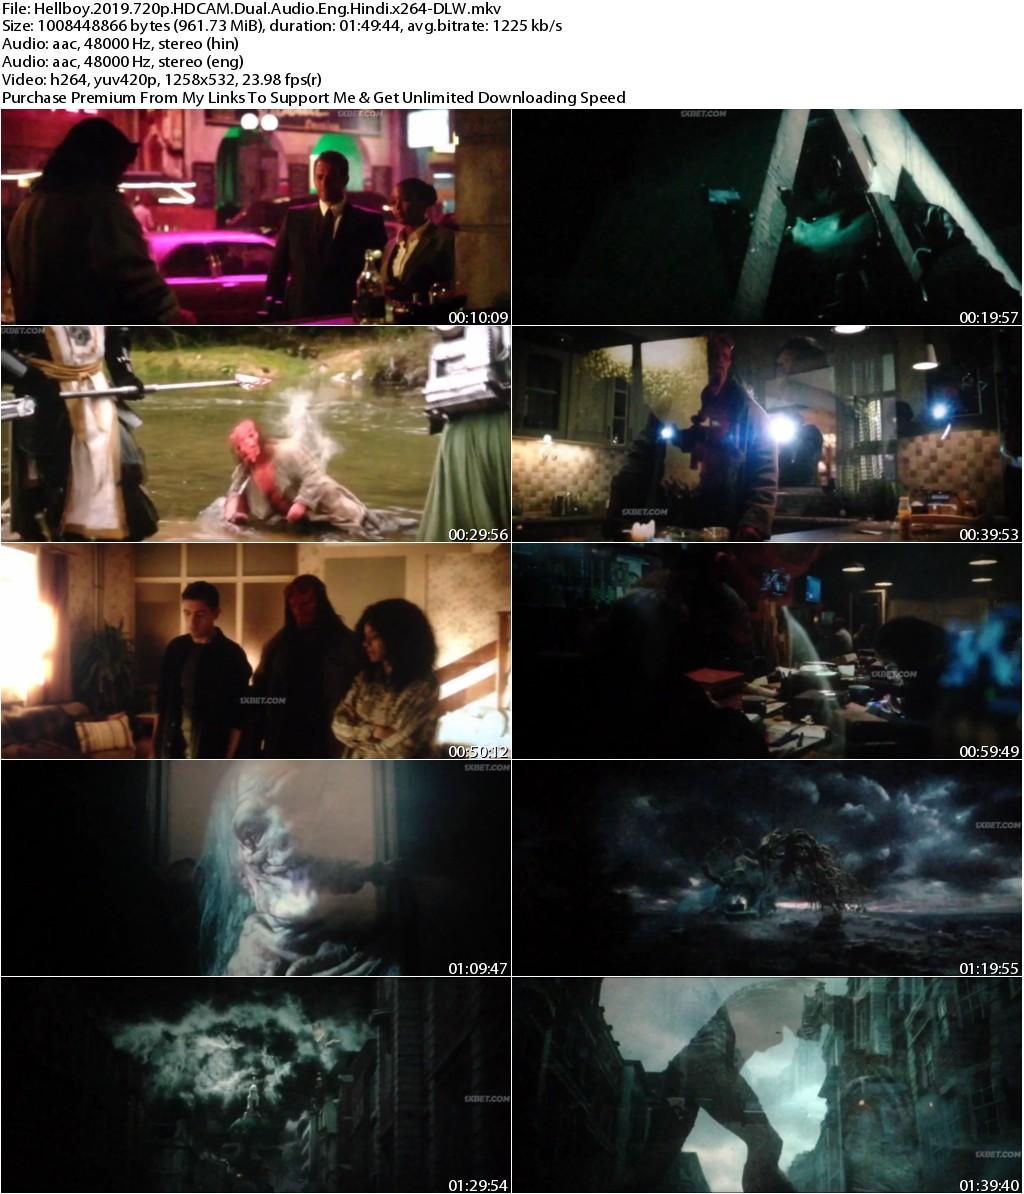 Hellboy (2019) 720p HDCAM Dual Audio Eng Hindi x264-DLW